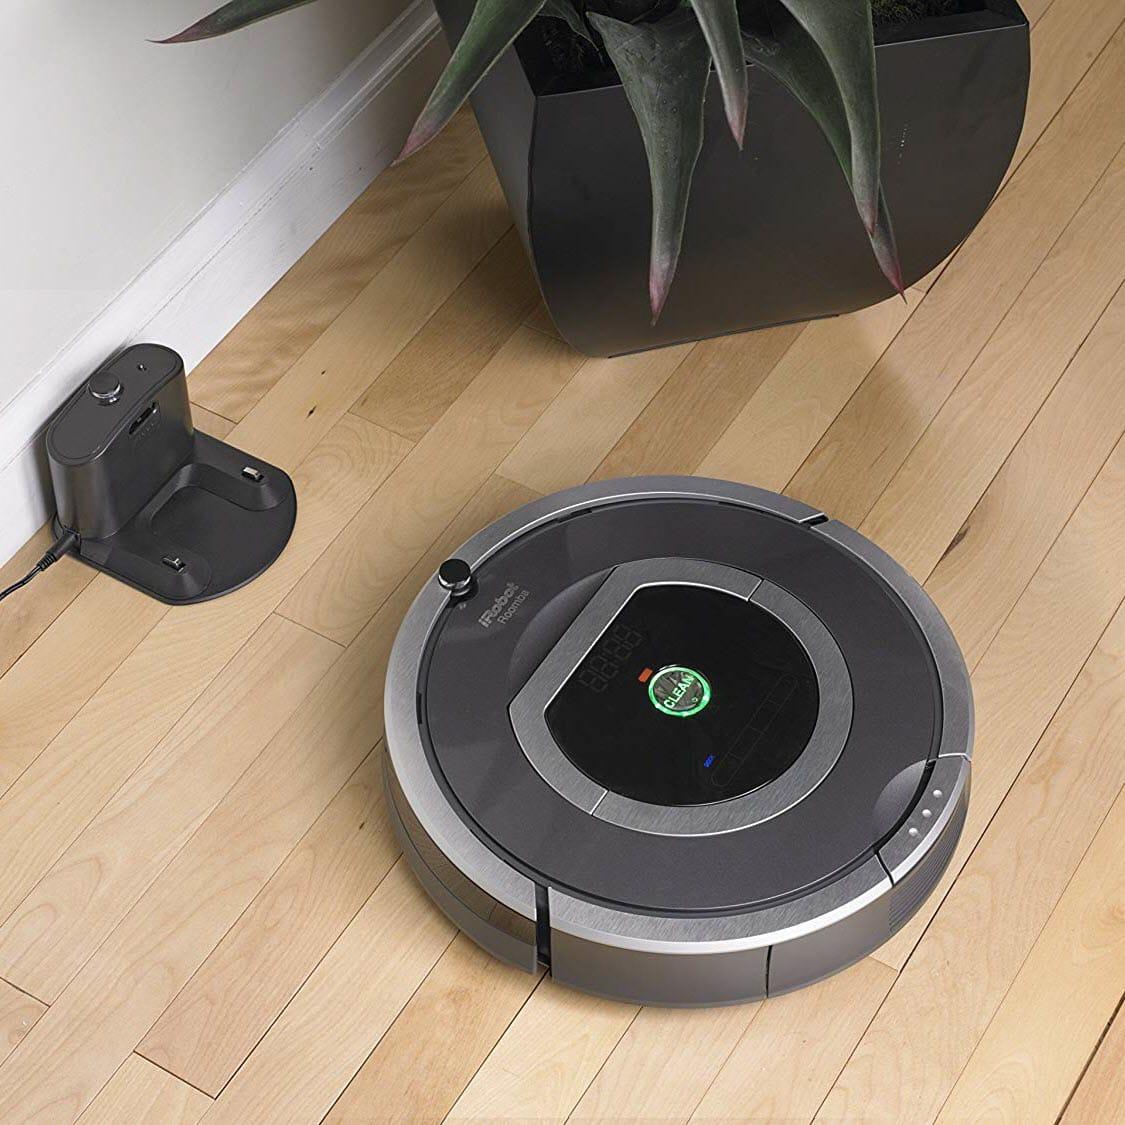 Robot hút bụi iRobot Roomba 780 Staubsaug